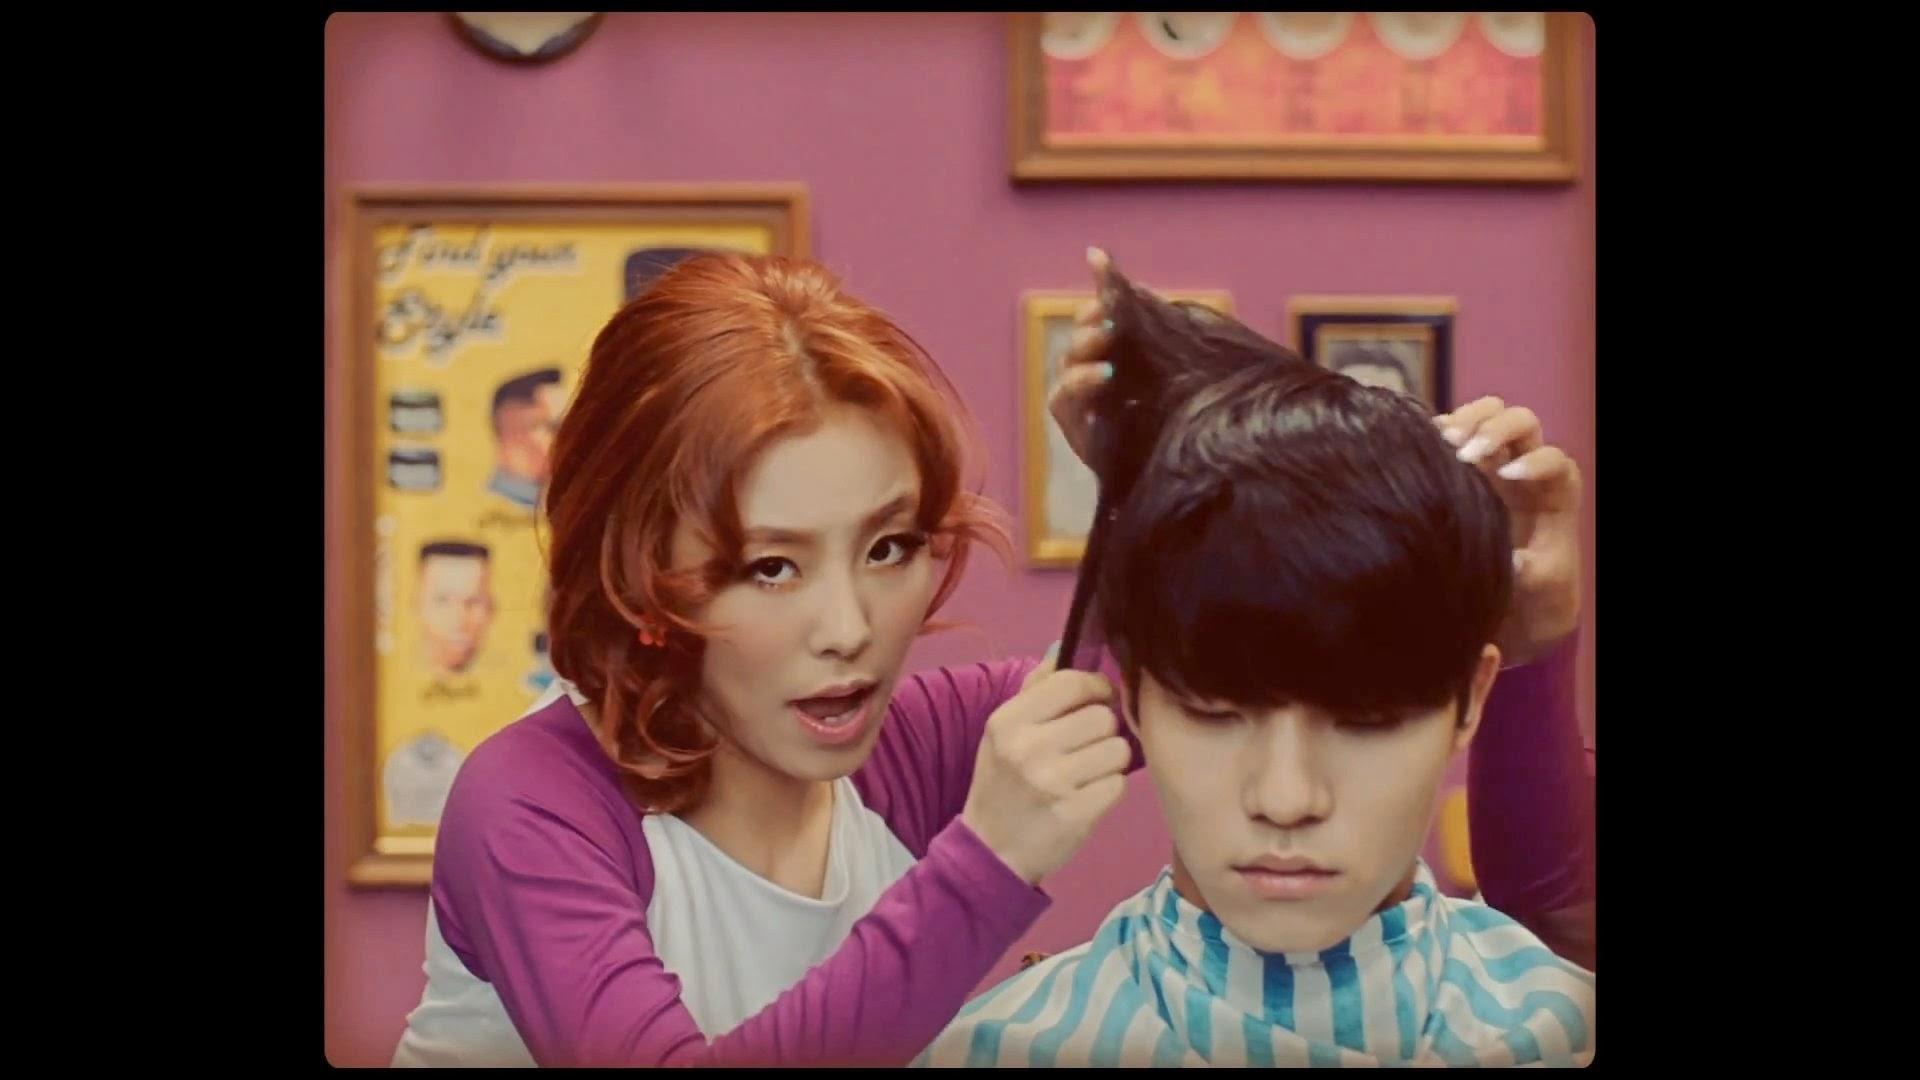 Mamamoo's Wheein in Ahh Oop MV